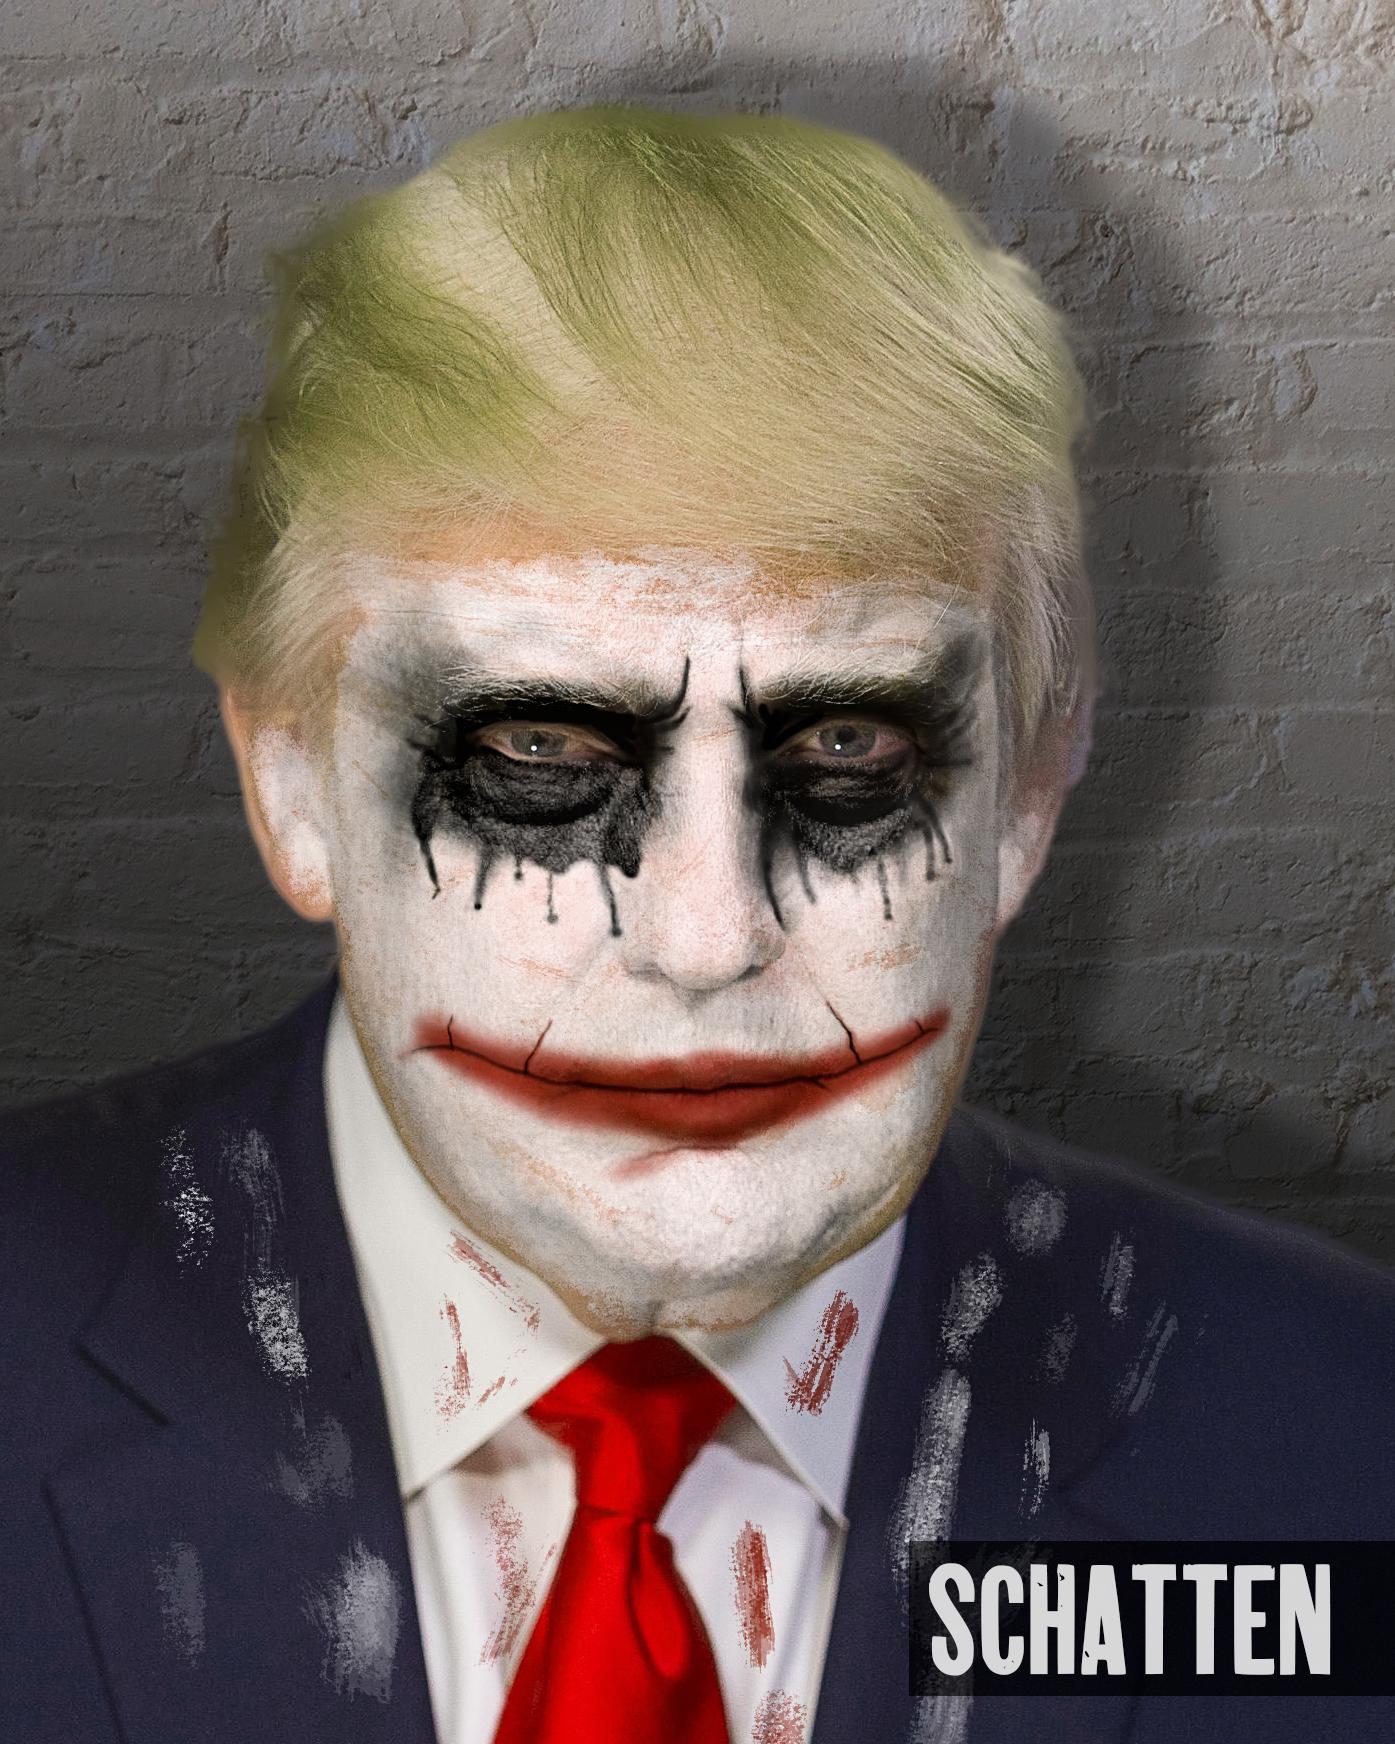 08 Donald Trump Joker